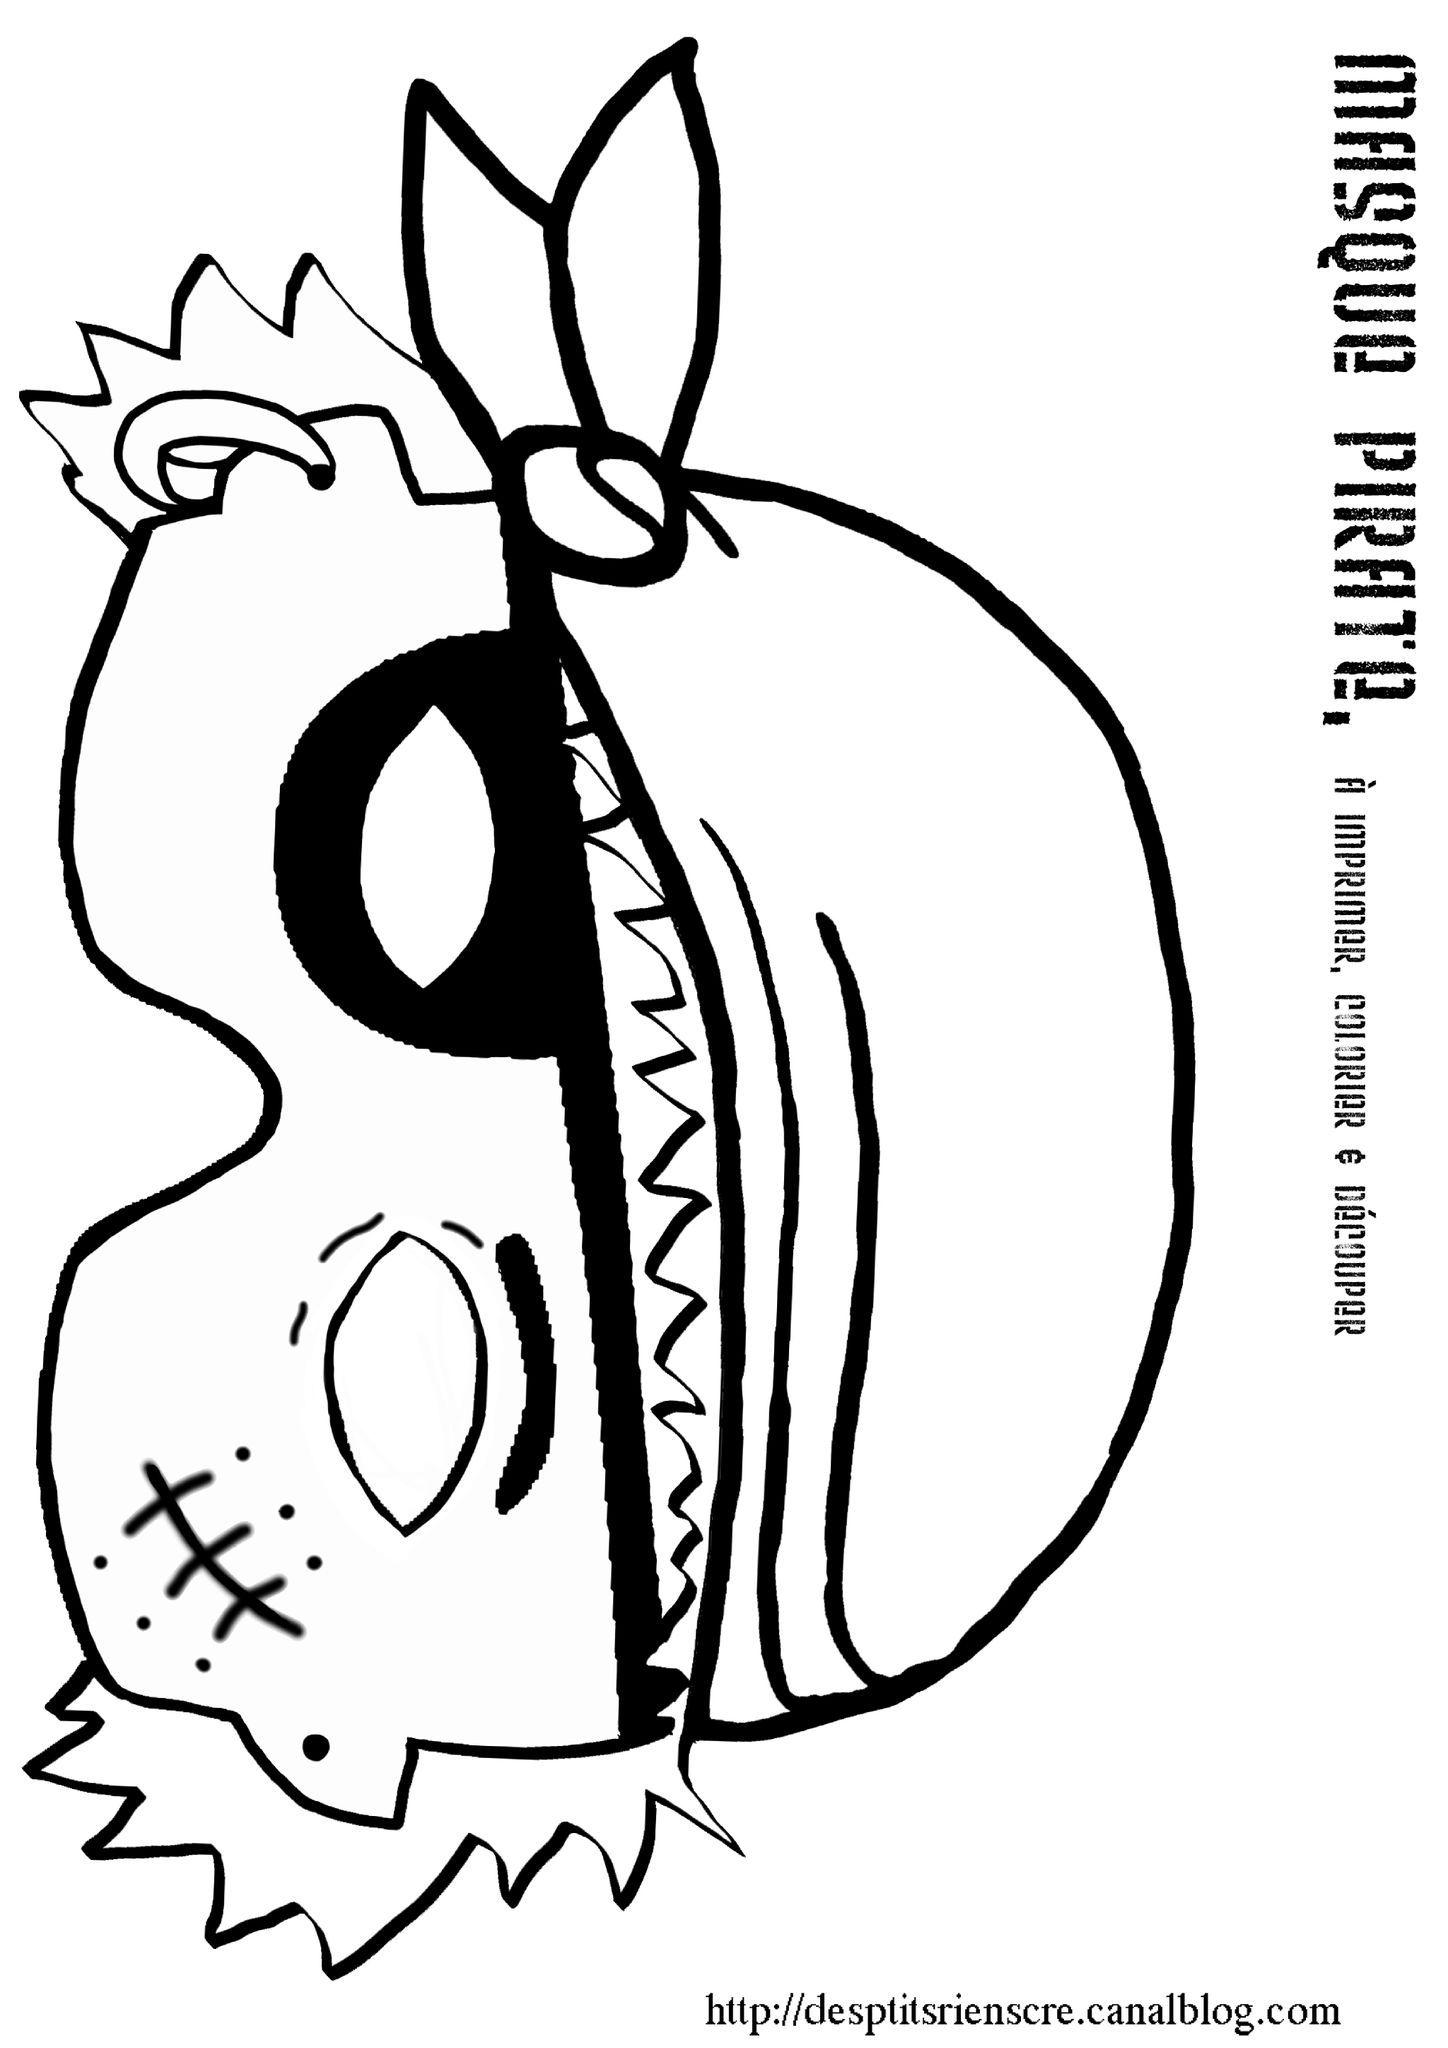 Pirate imprimer colorier oc an jack le pirate - Dessin de coffre de pirate ...